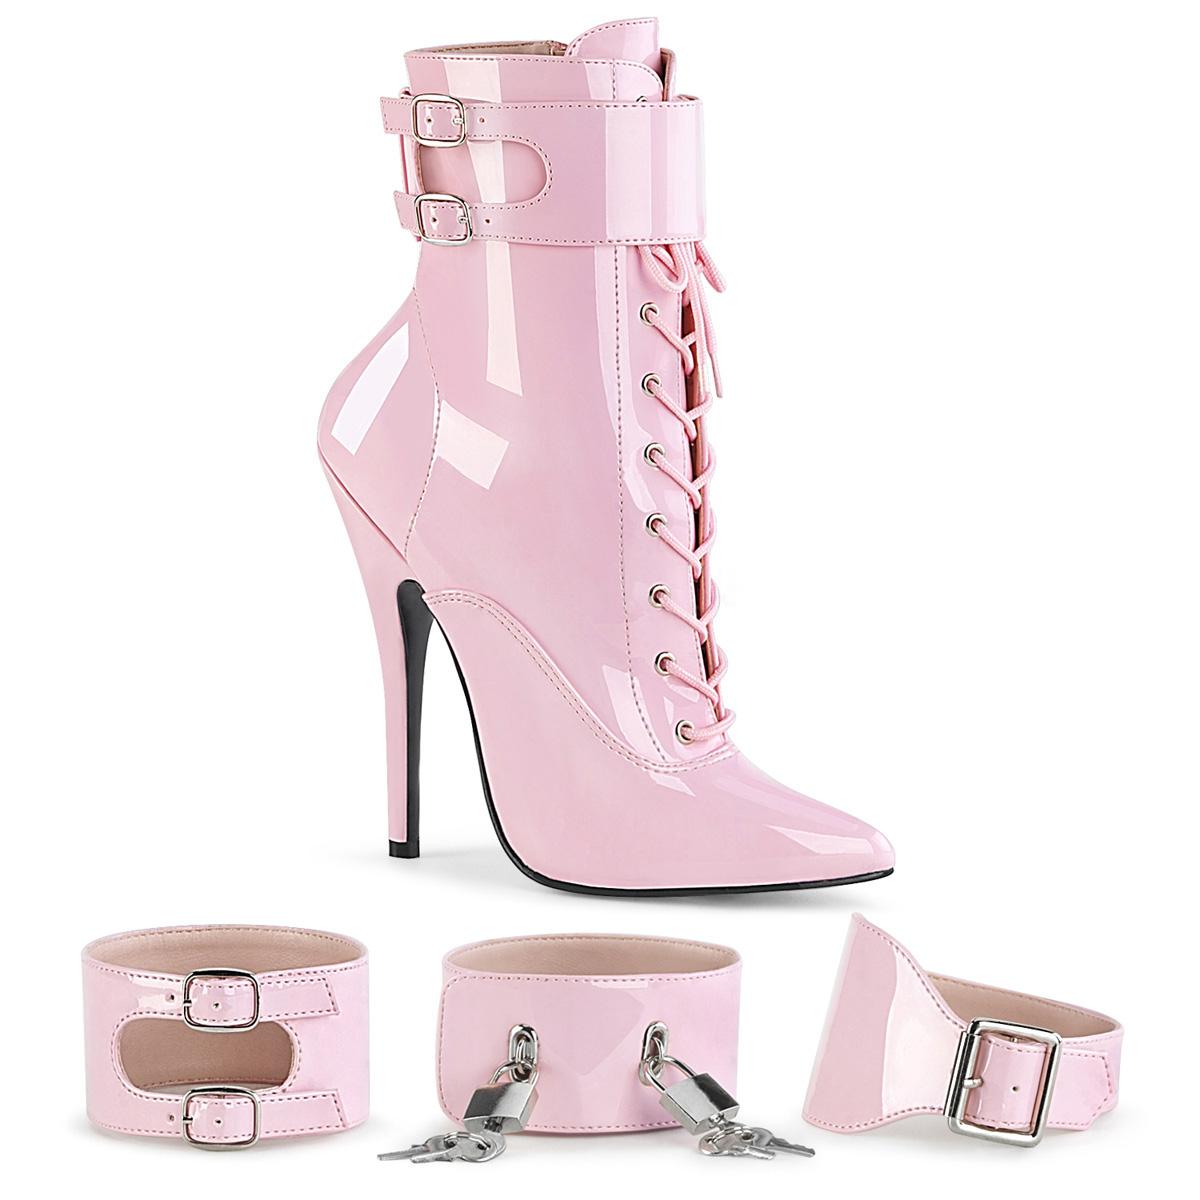 Extreme High Heels DOMINA-1023 - Patent